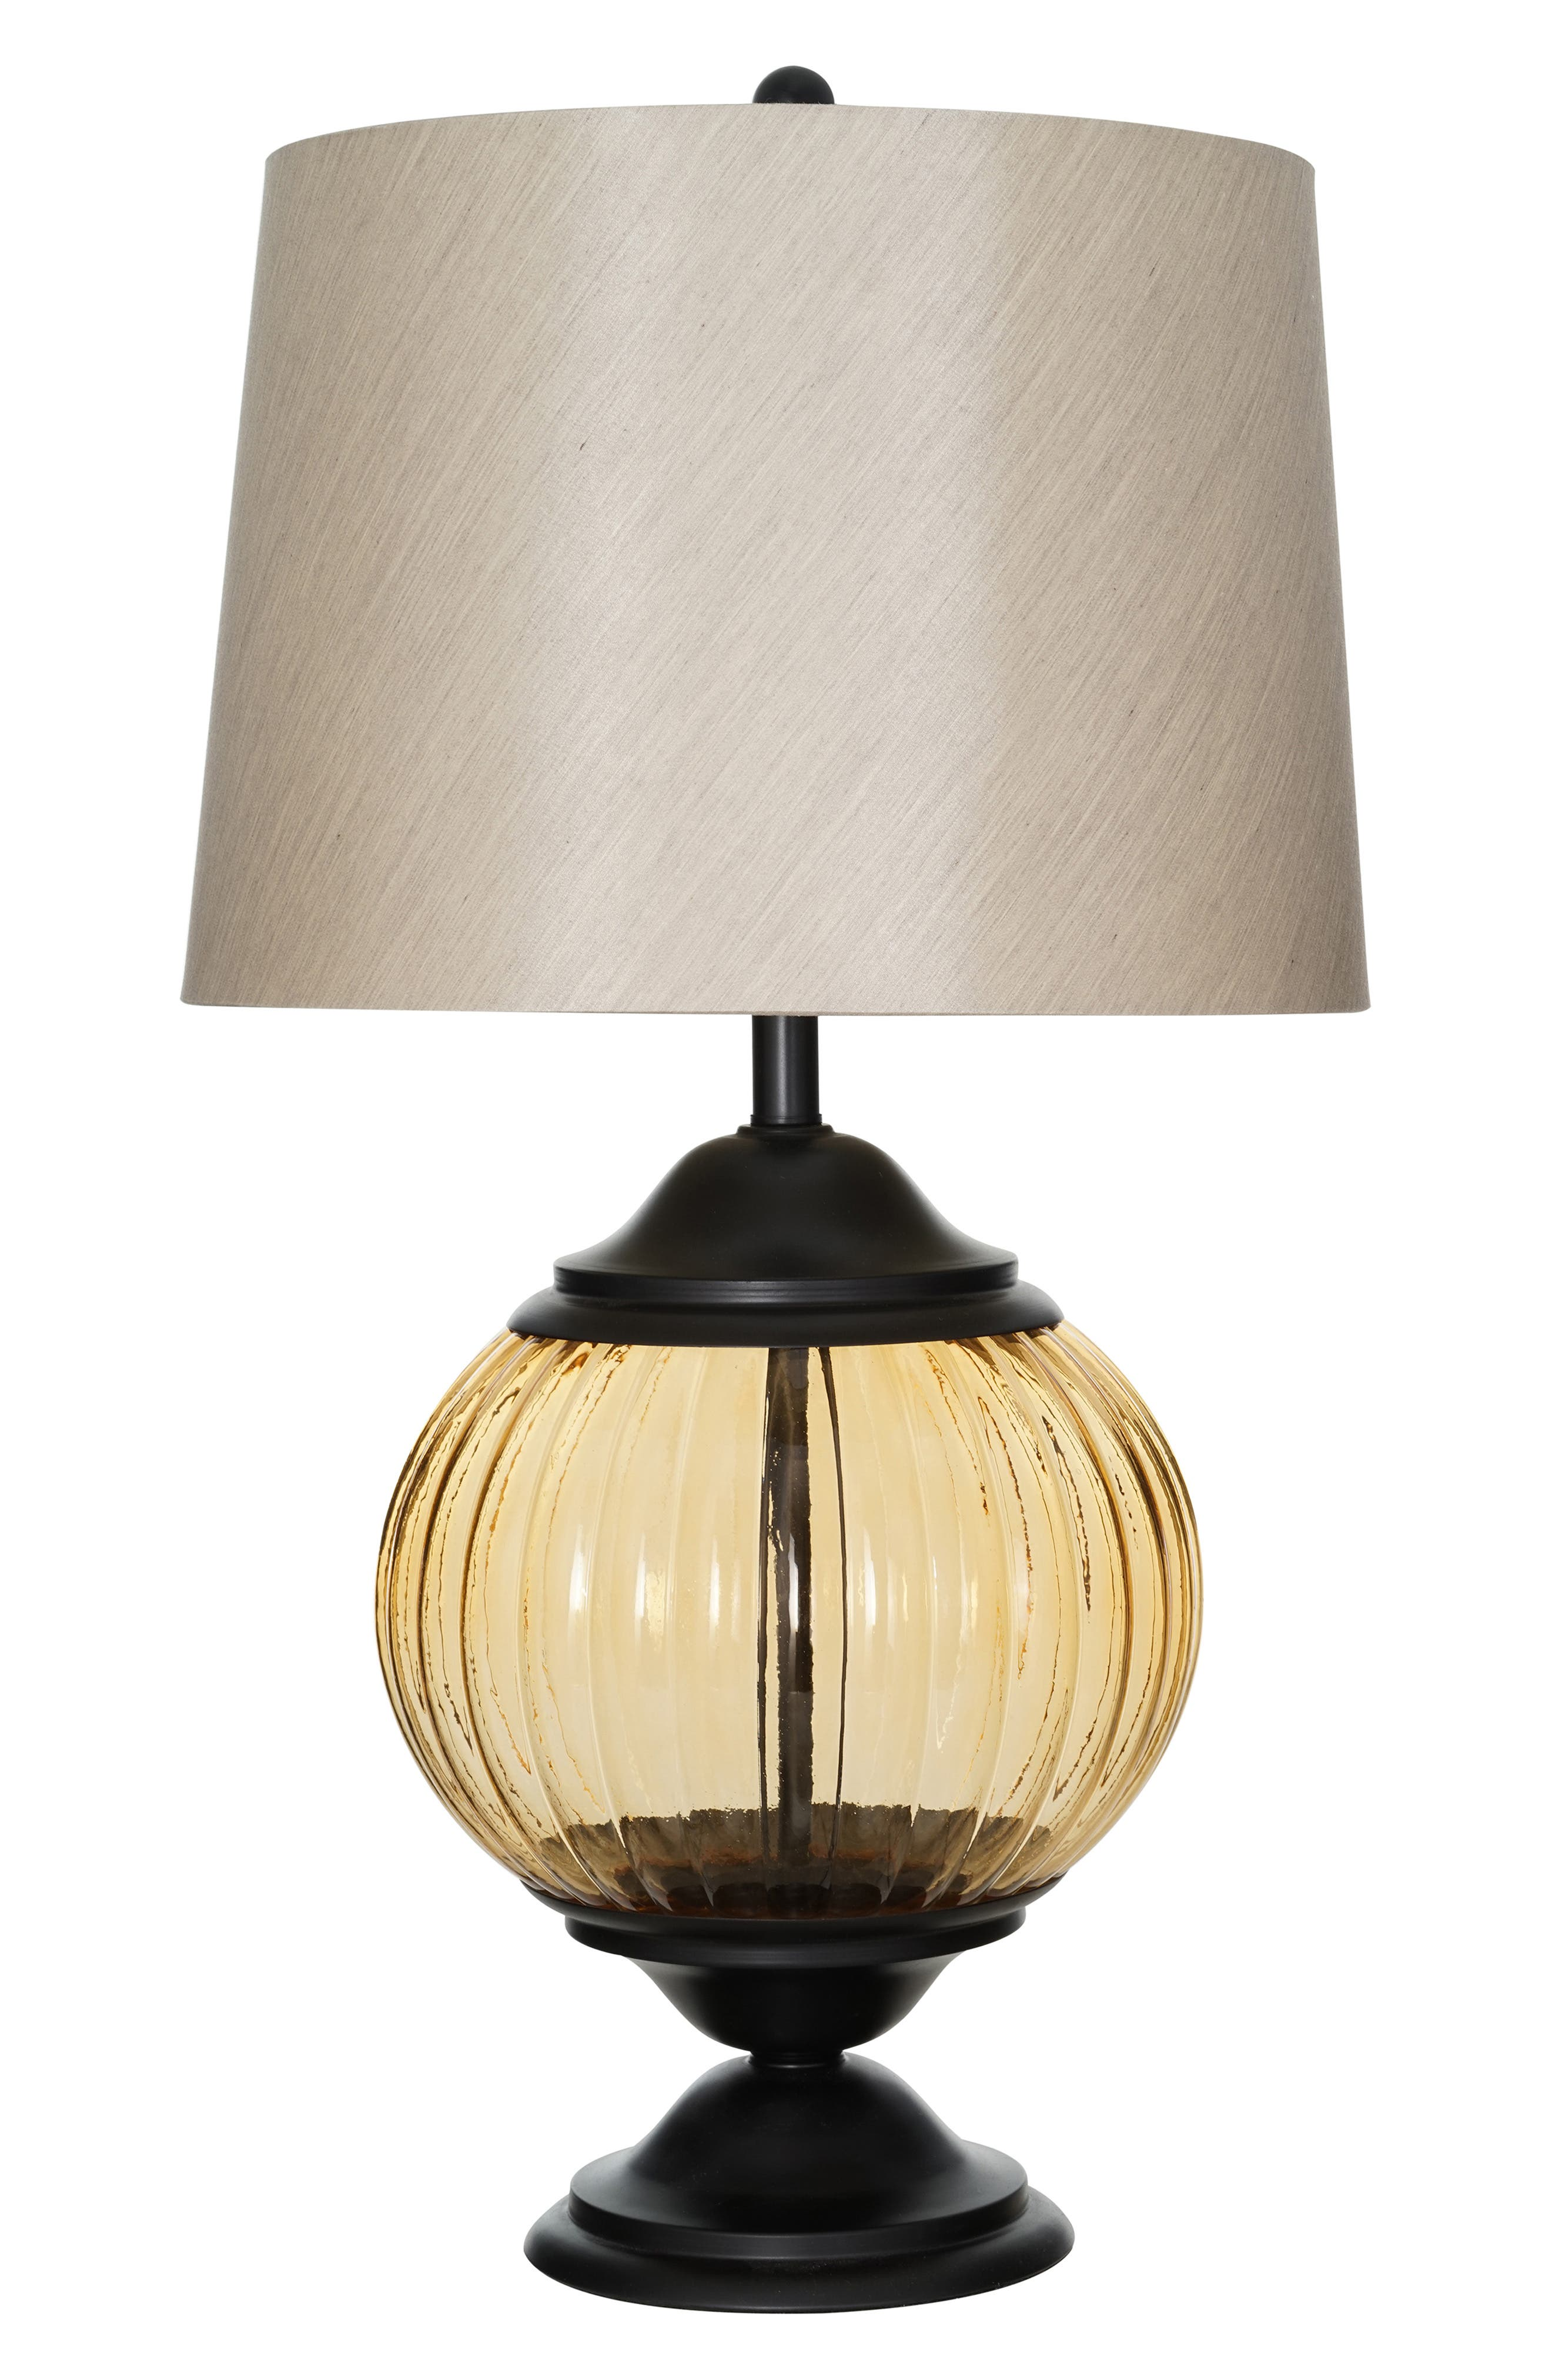 kate spade lamp design jalexander lighting sutton table lamp lighting lamps fans nordstrom